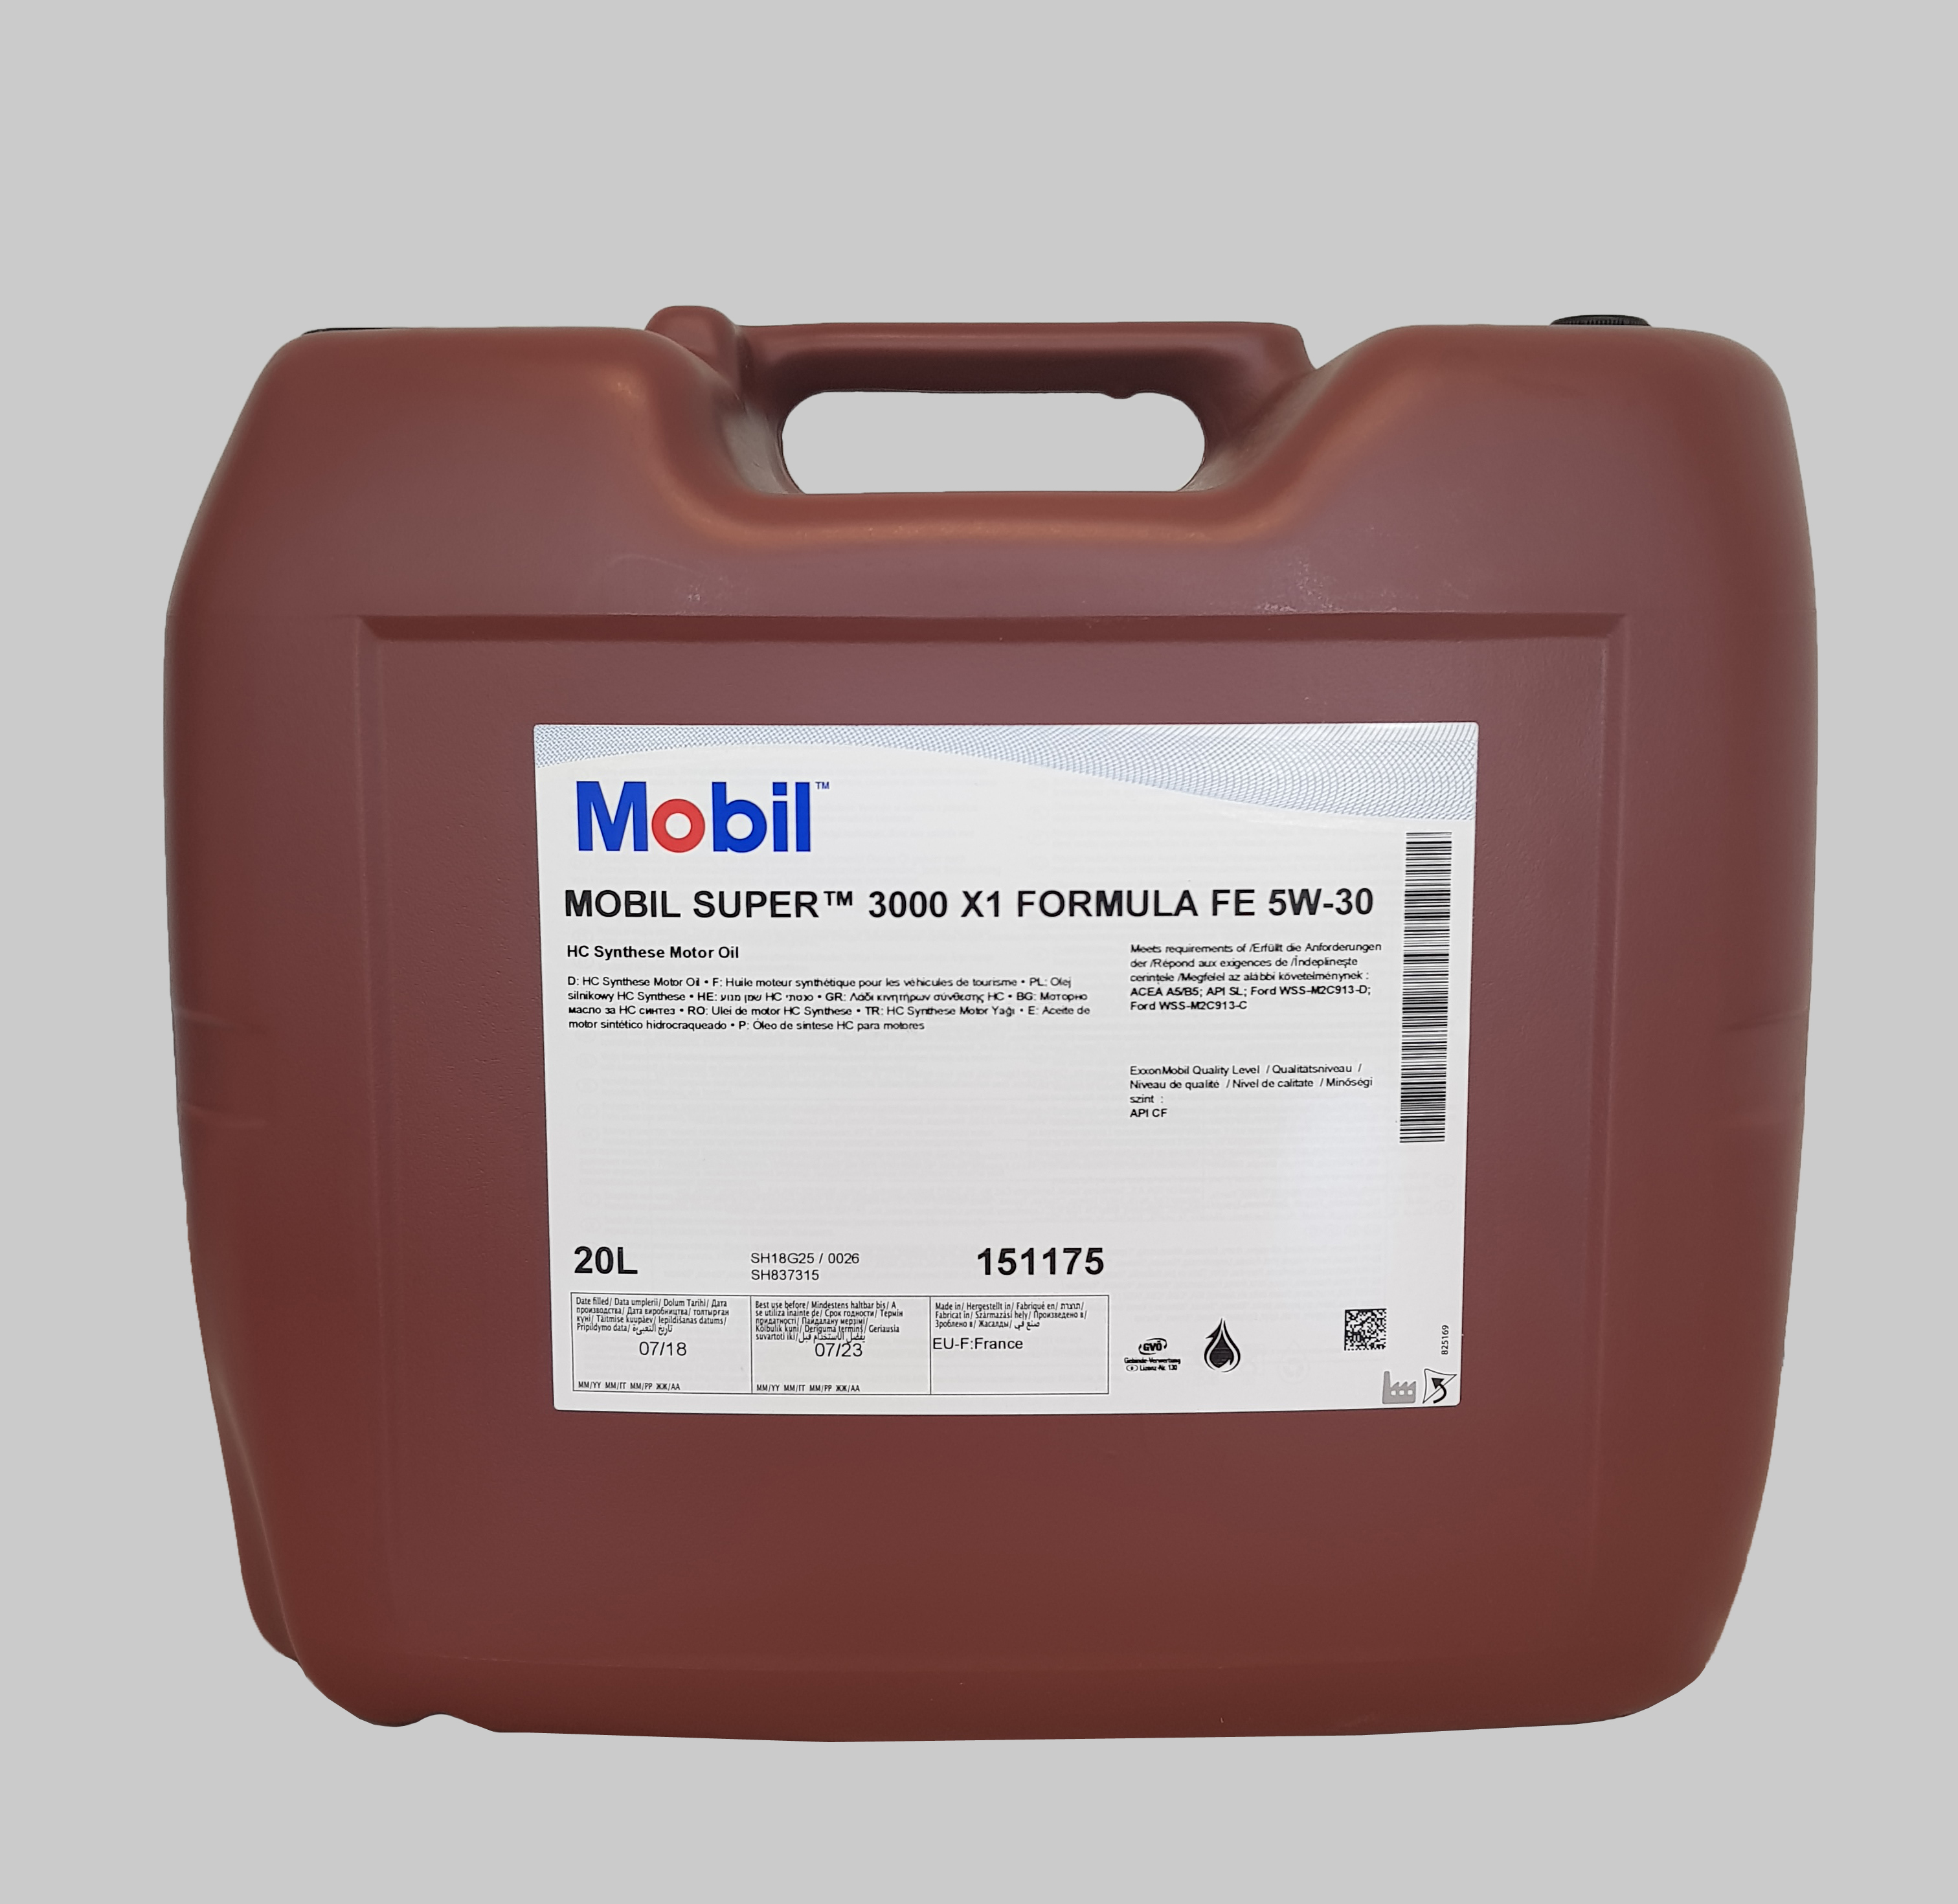 Mobil Super 3000 X1 Formula FE 5W-30 20 Liter